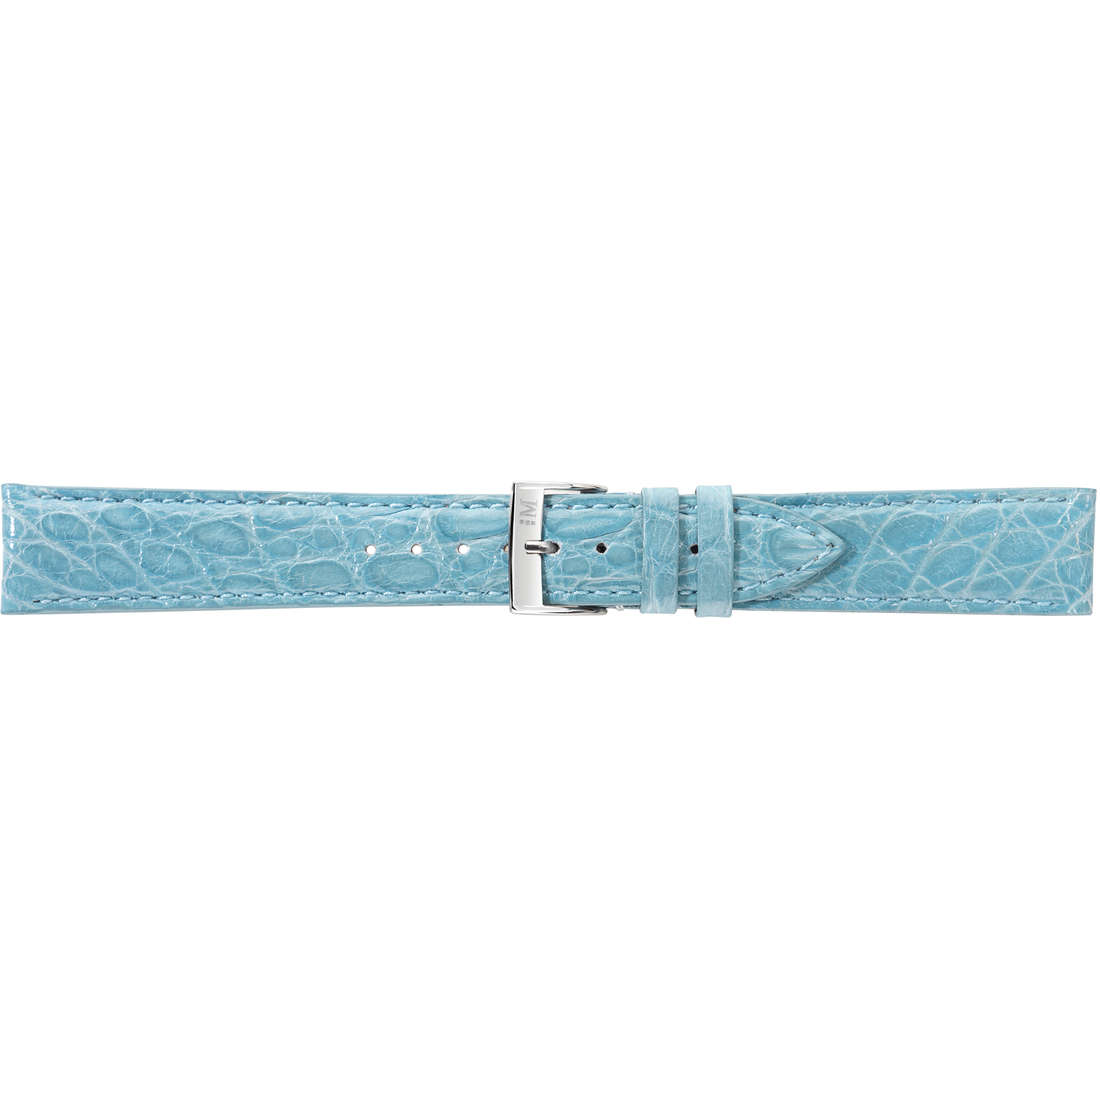 watch watch bands watch straps man Morellato Pelli Preziose A01X2197052168CR14